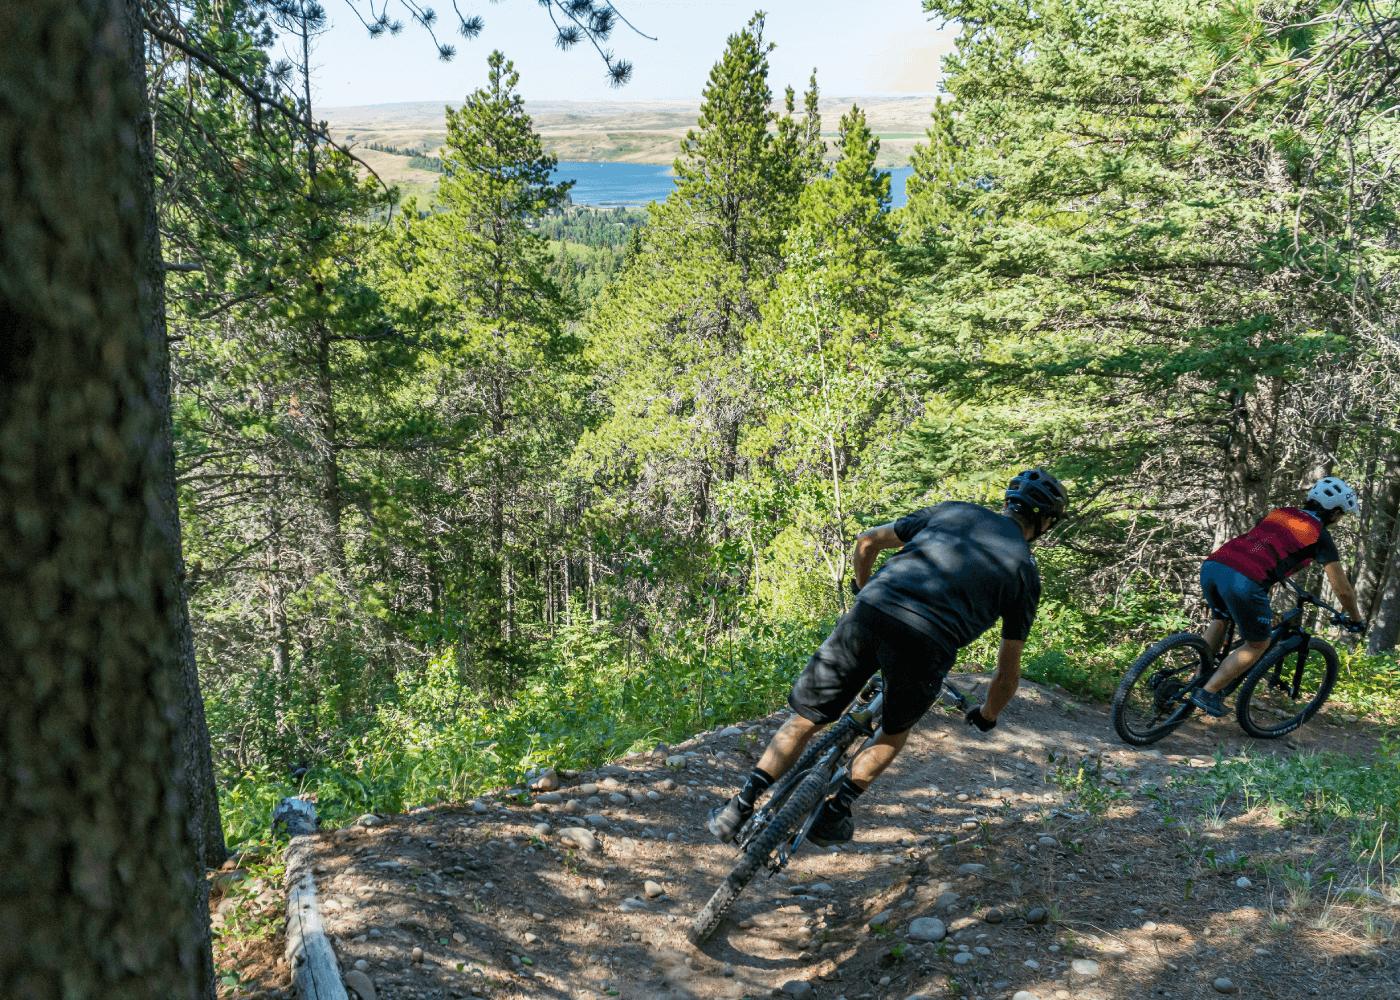 Bike Riding in Cypress Hills Interprovincial Park